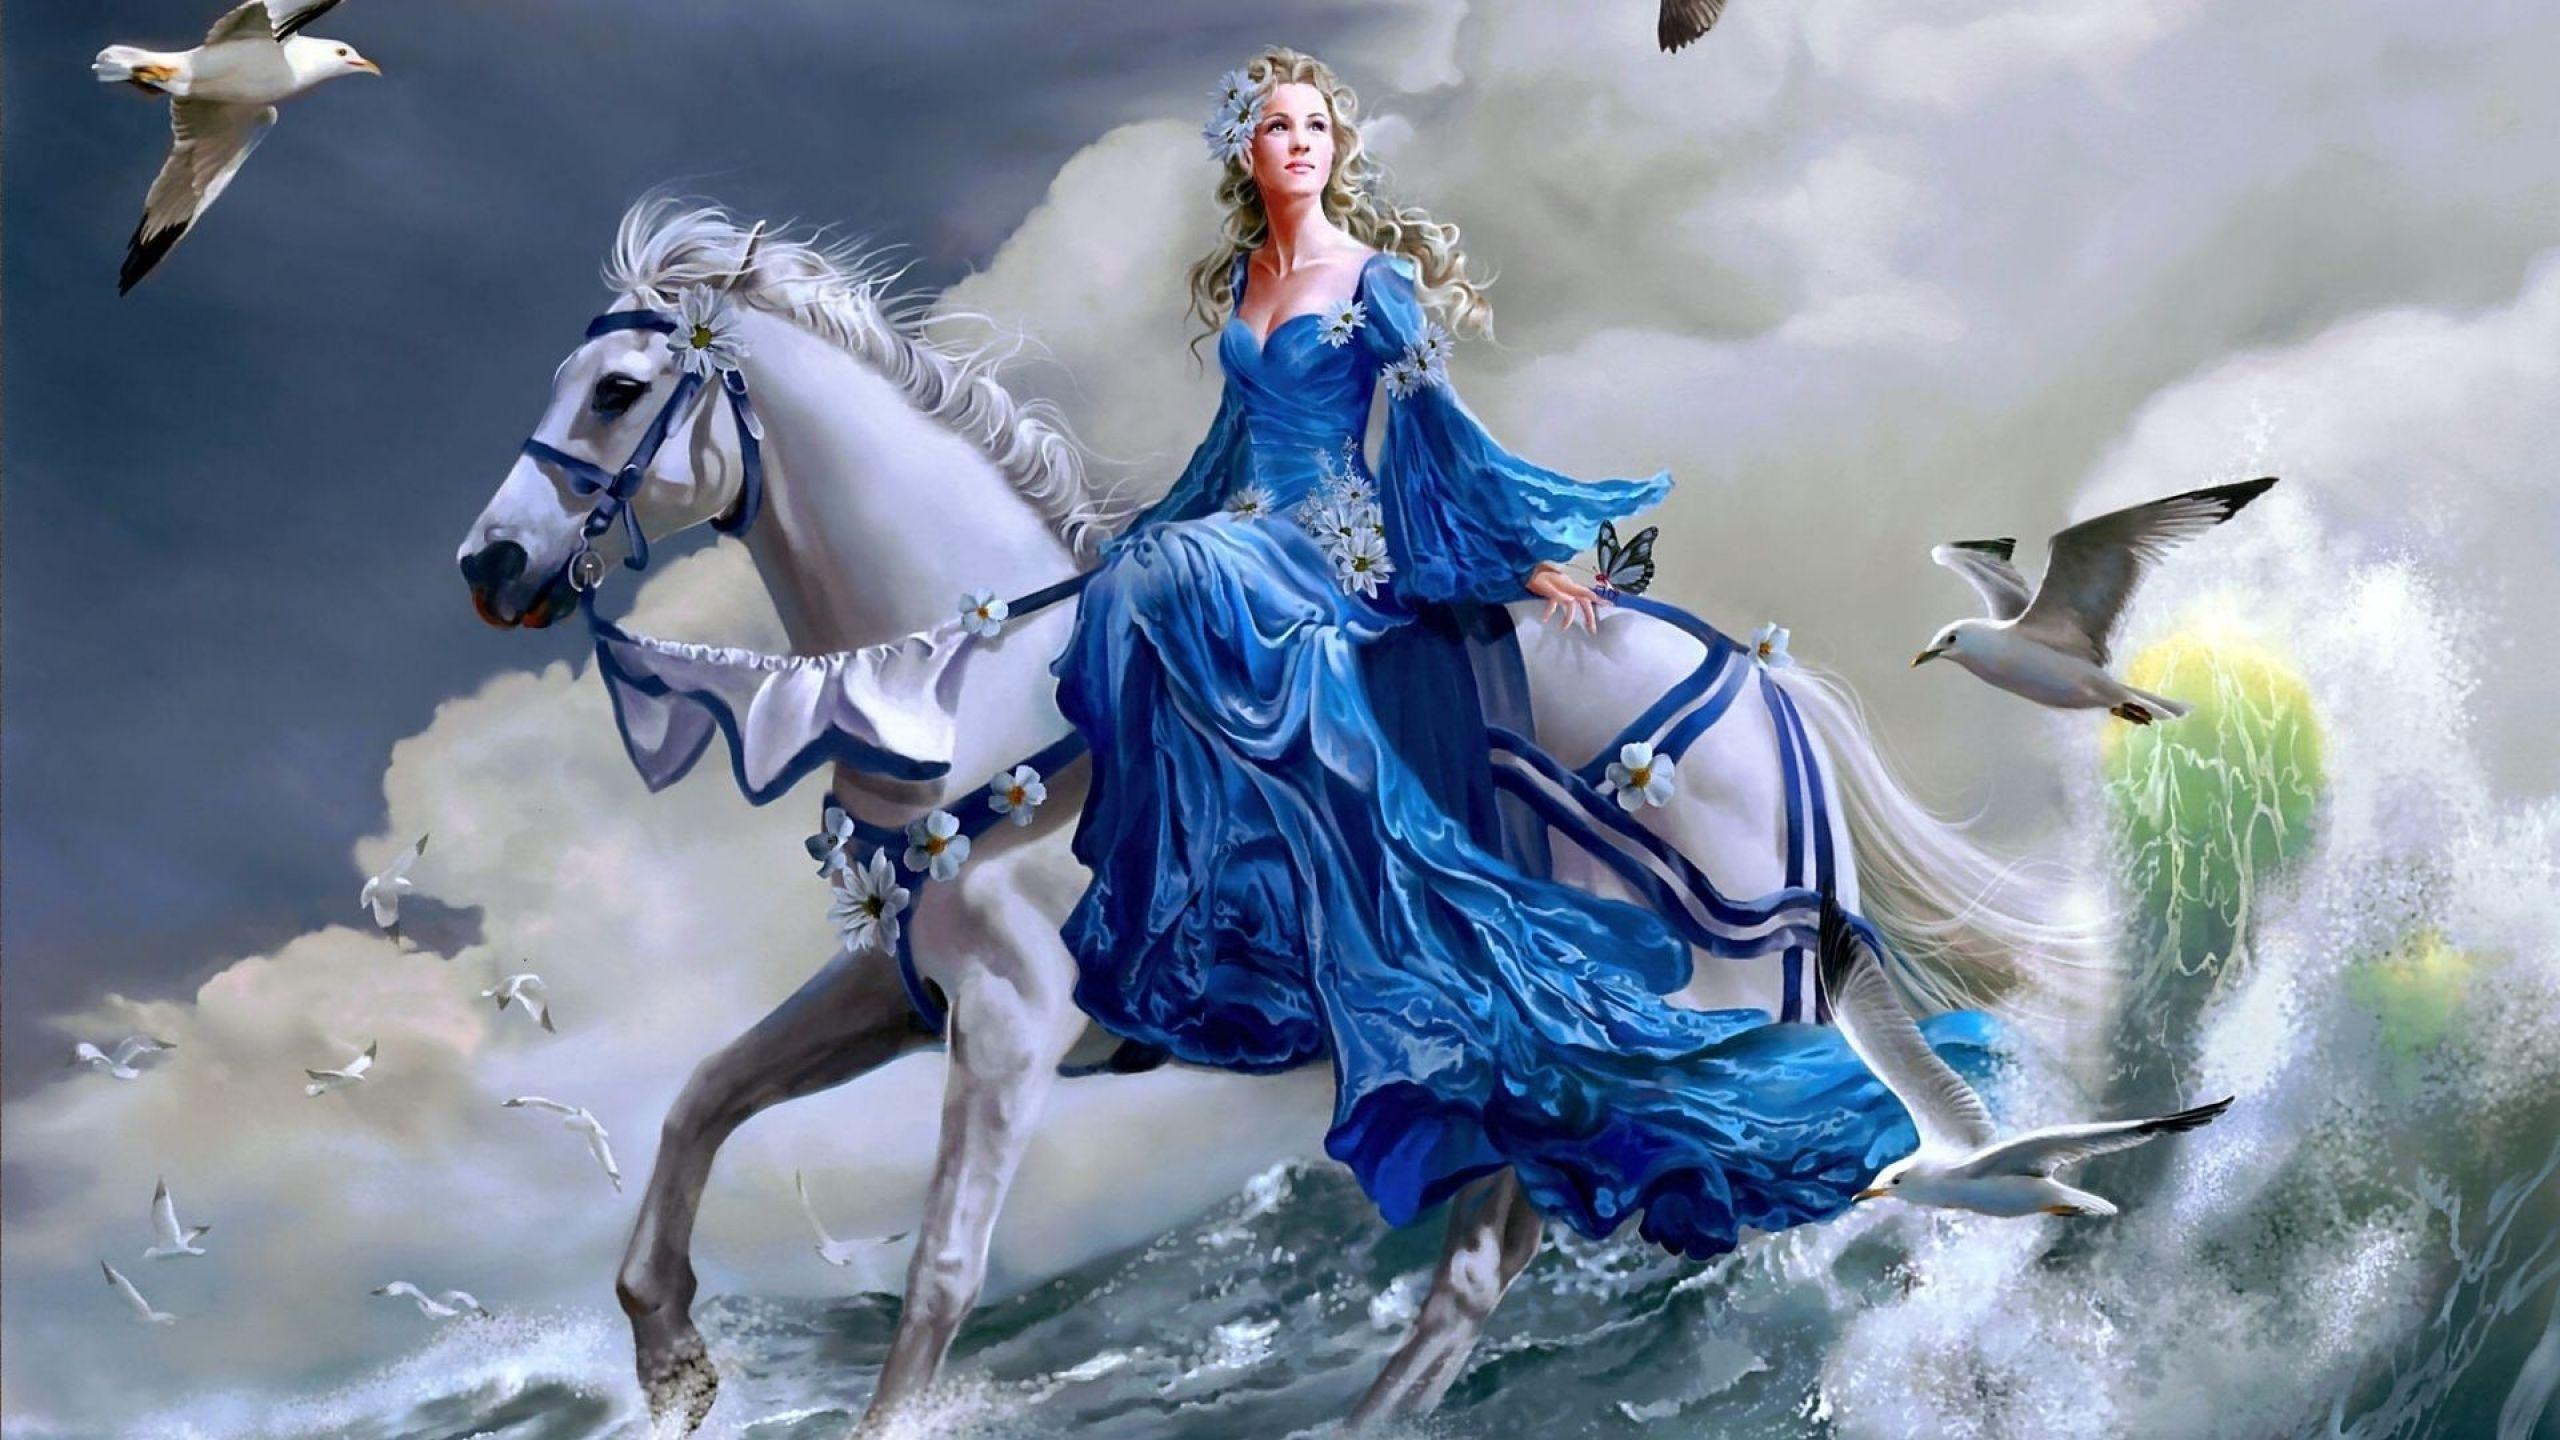 Fantasy Women Woman Fantasy Horse Bird Water Ocean Wallpaper ...